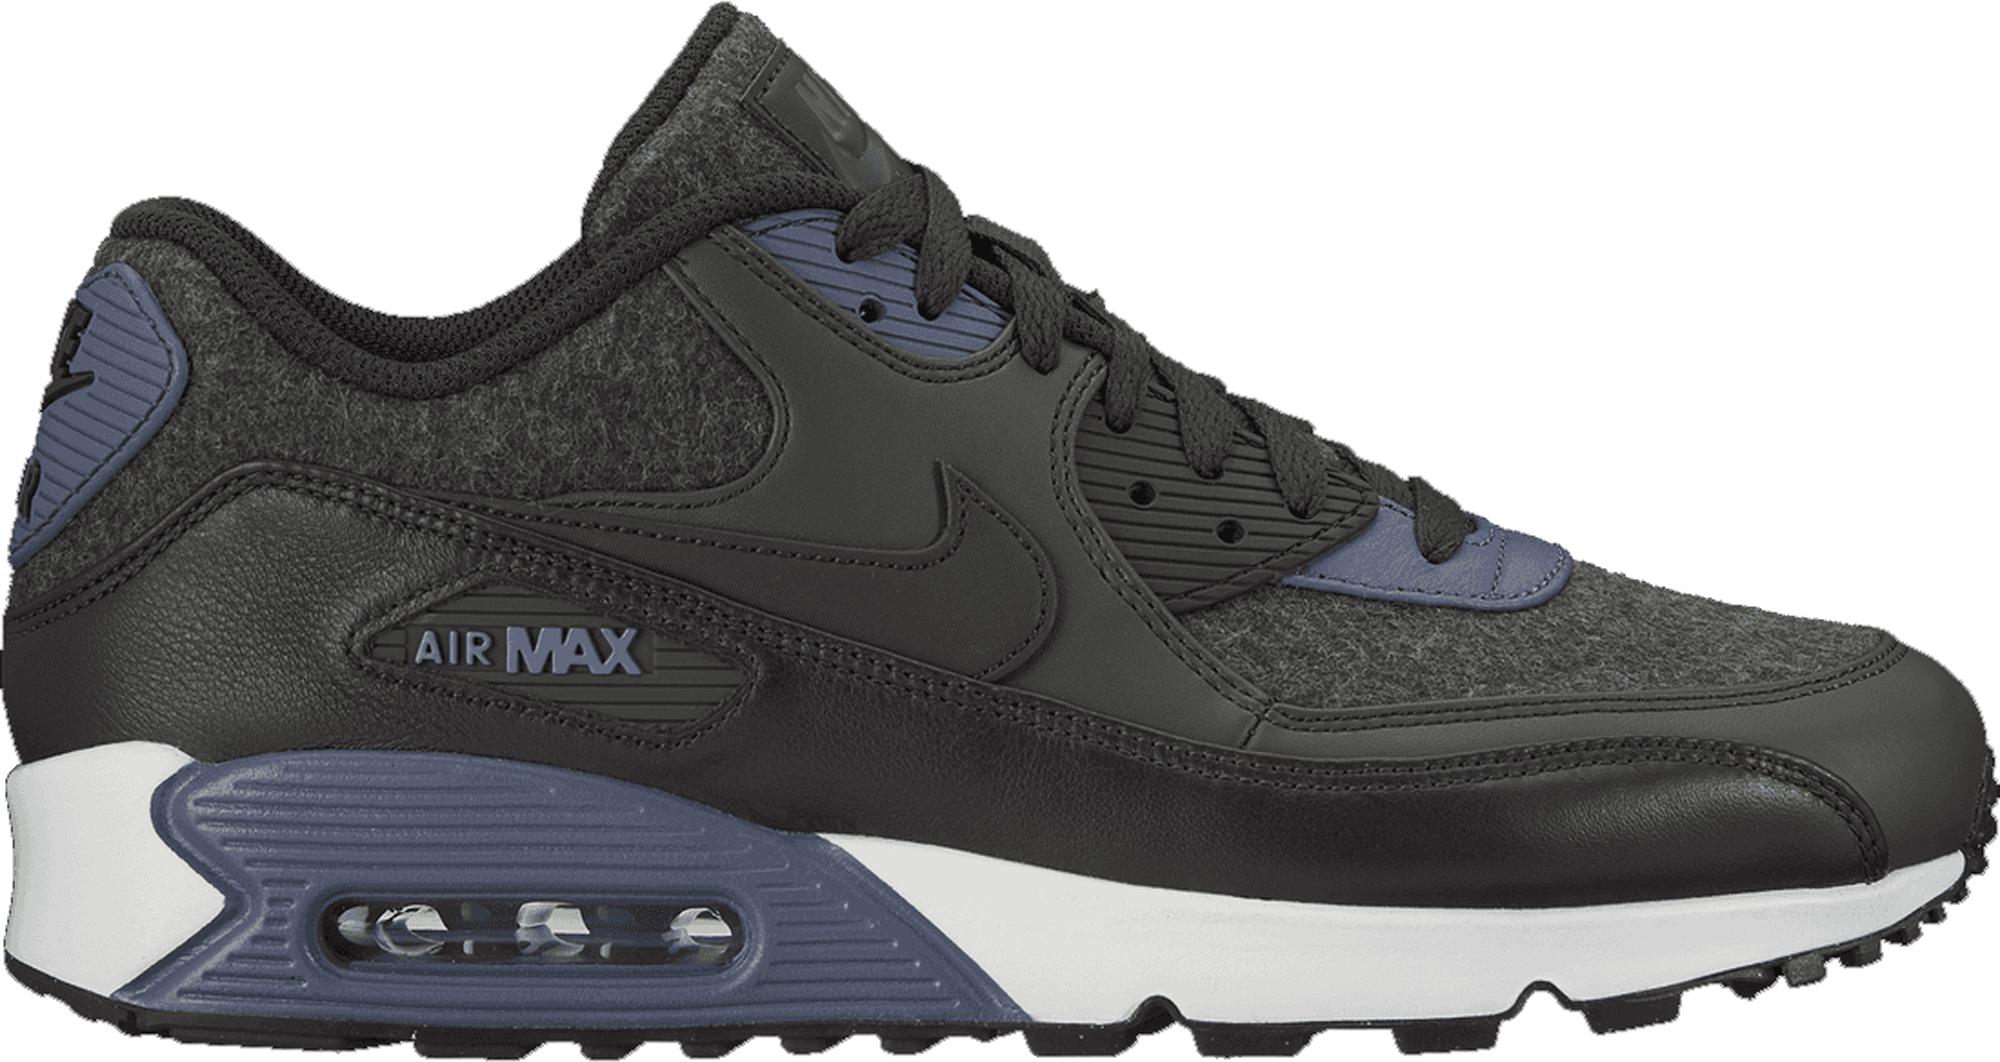 Nike Air Max 90 Wool Sequoia - 700155-300